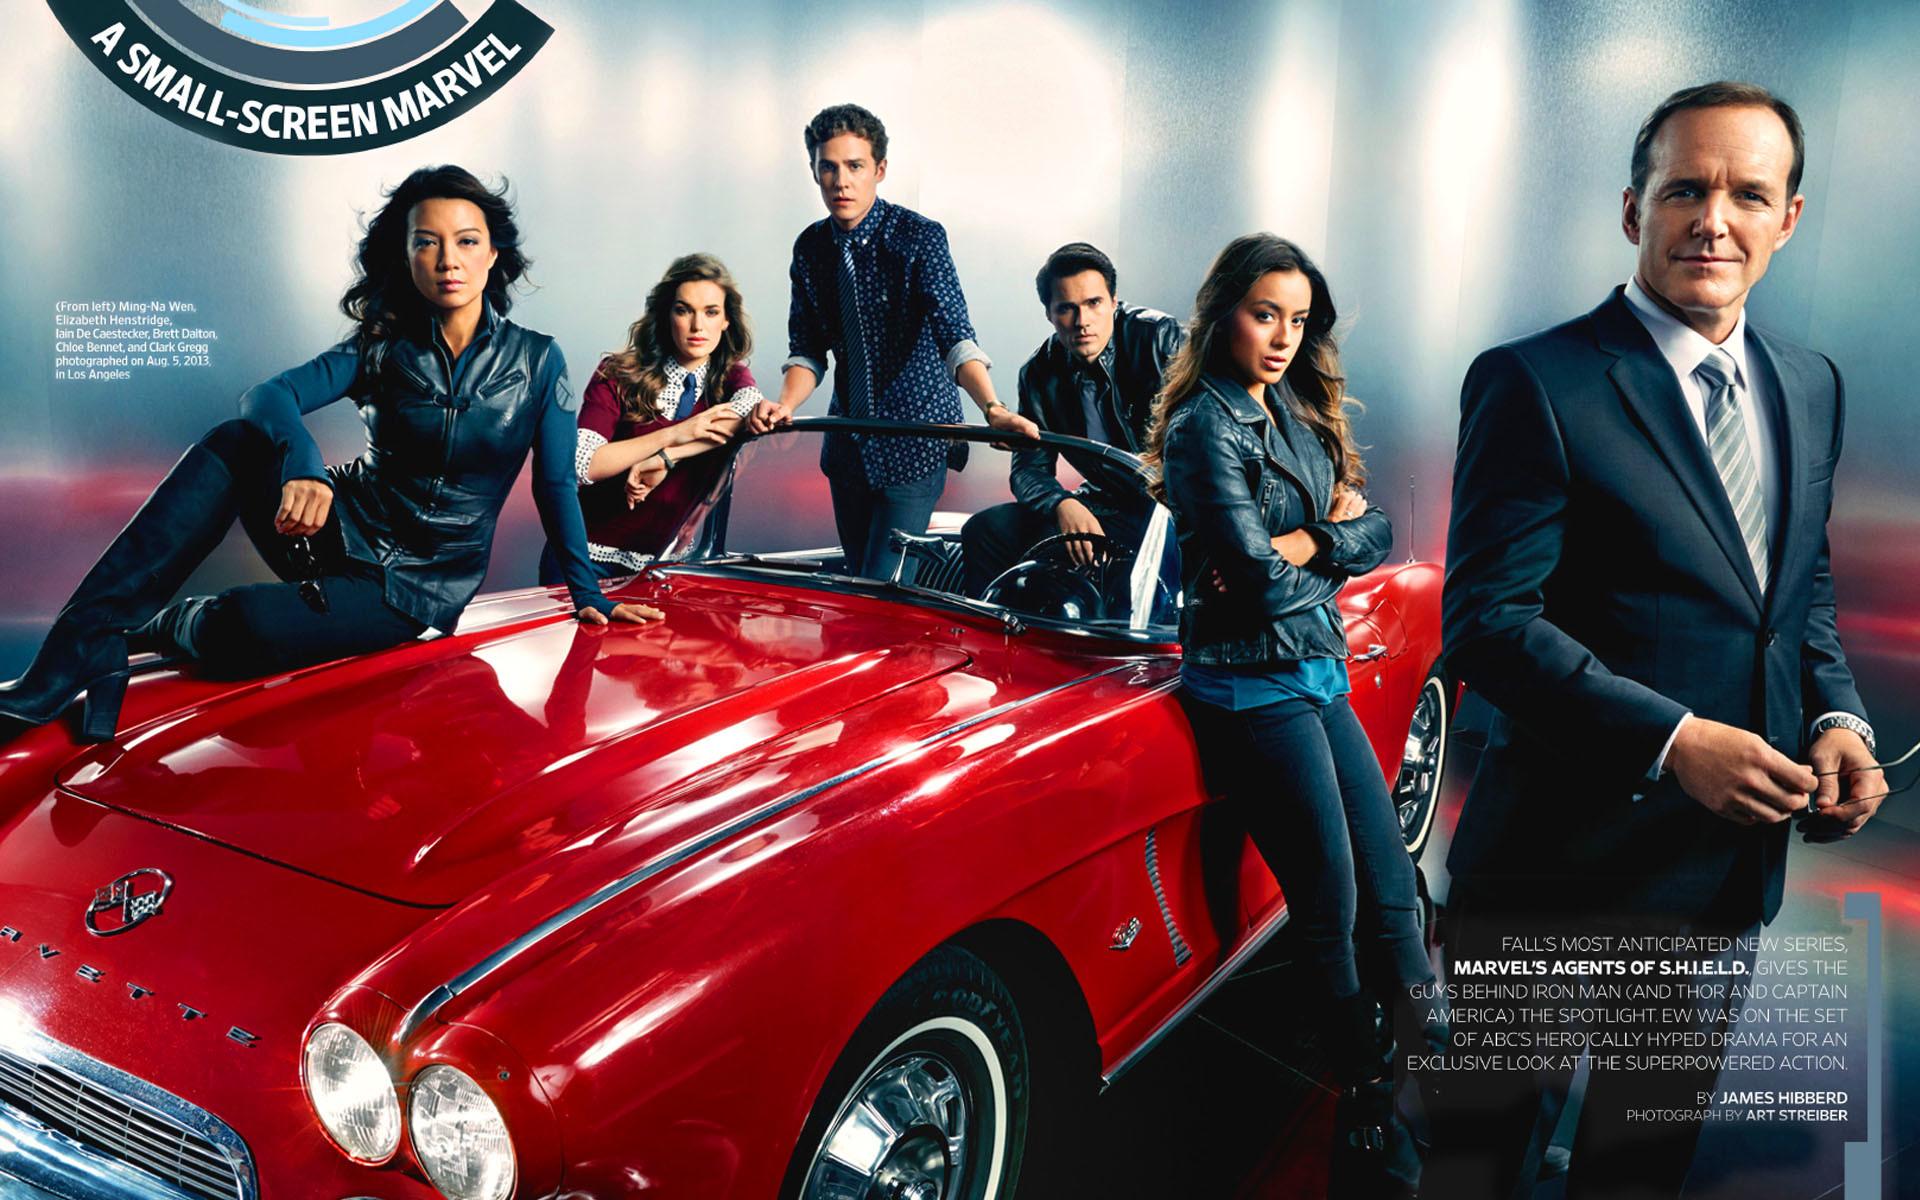 Marvel Agents of SHIELD HD Wallpaper